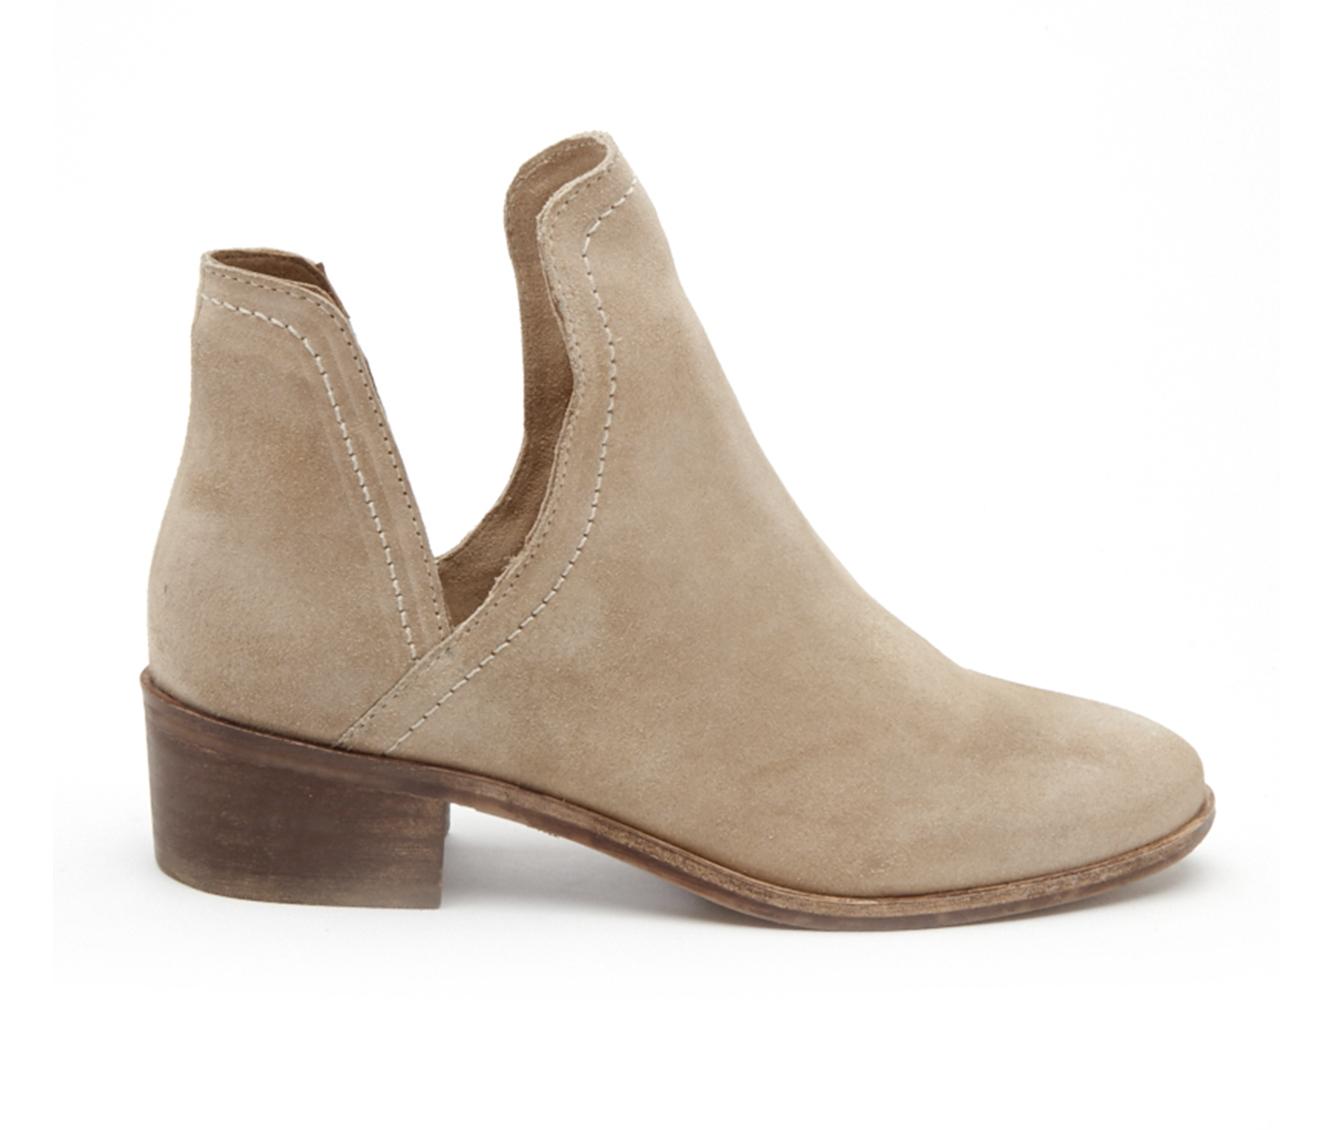 Coconuts Pronto Women's Boots (Beige - Suede)